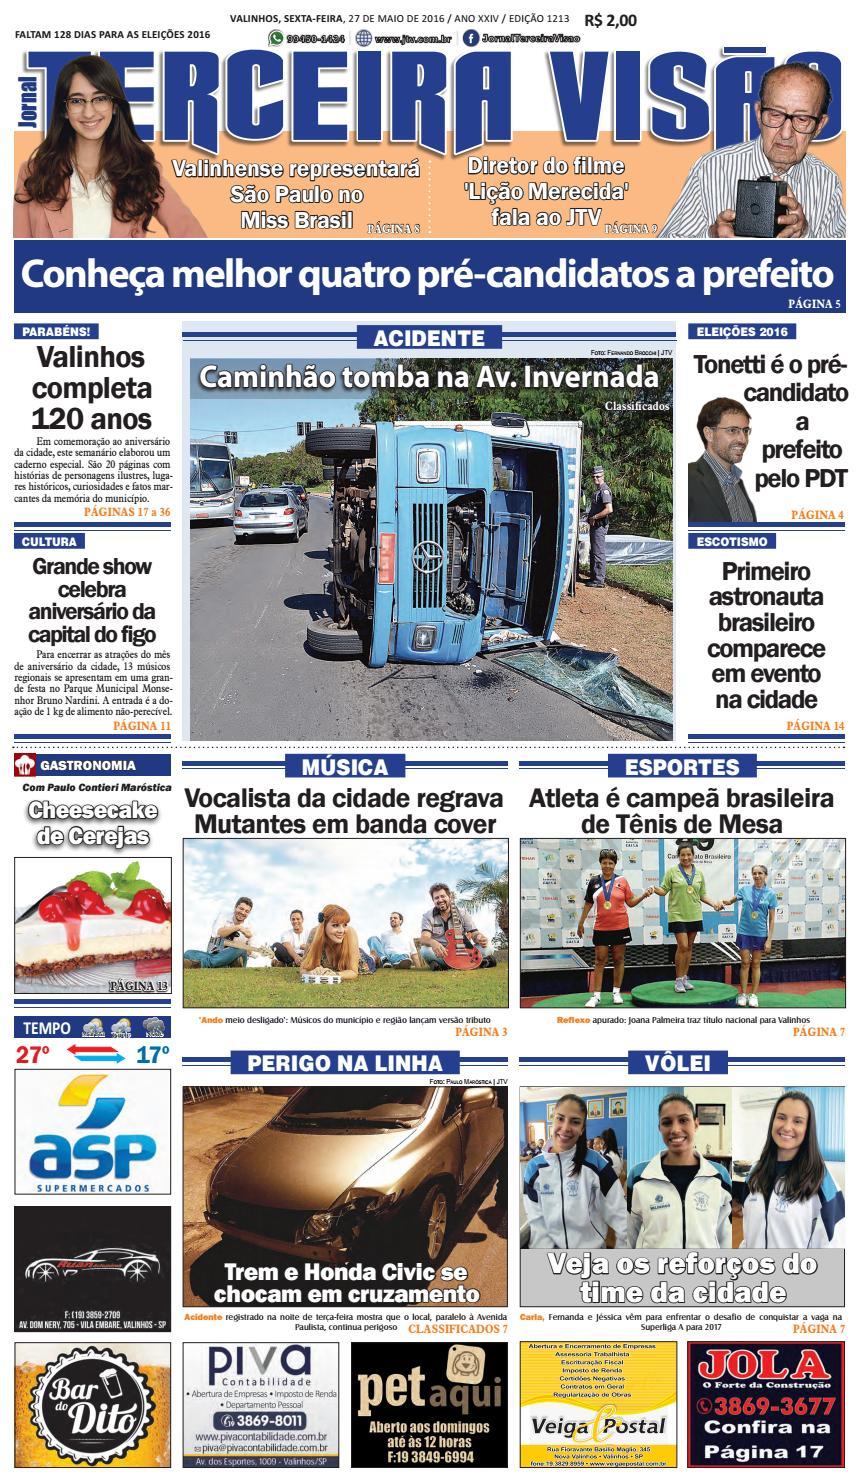 330ef692567b8 E1213 by Jornal Terceira Visão - issuu